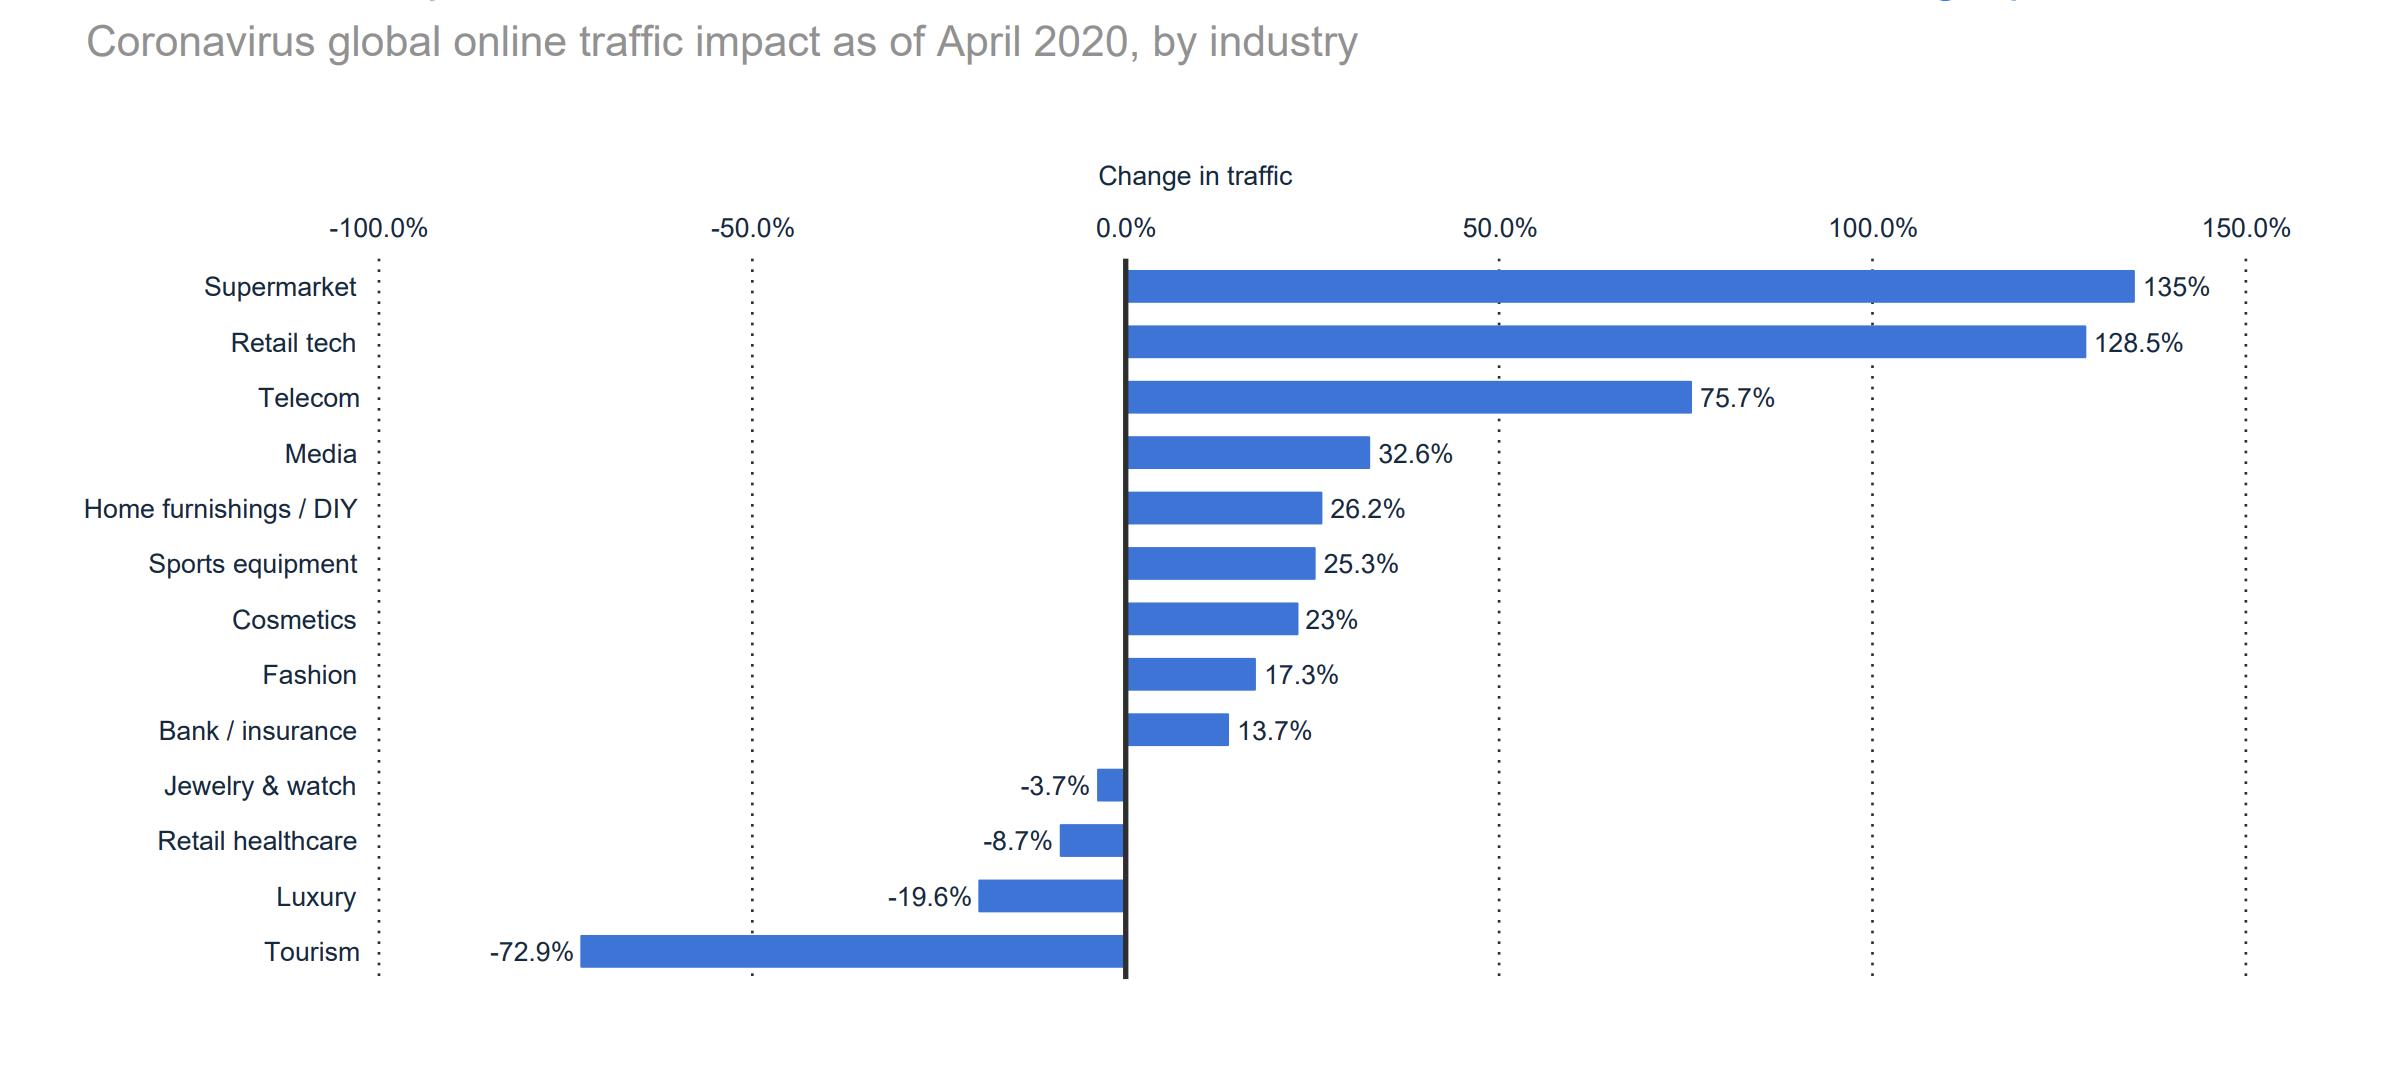 Coronavirus' impact on online traffic of selected industries worldwide